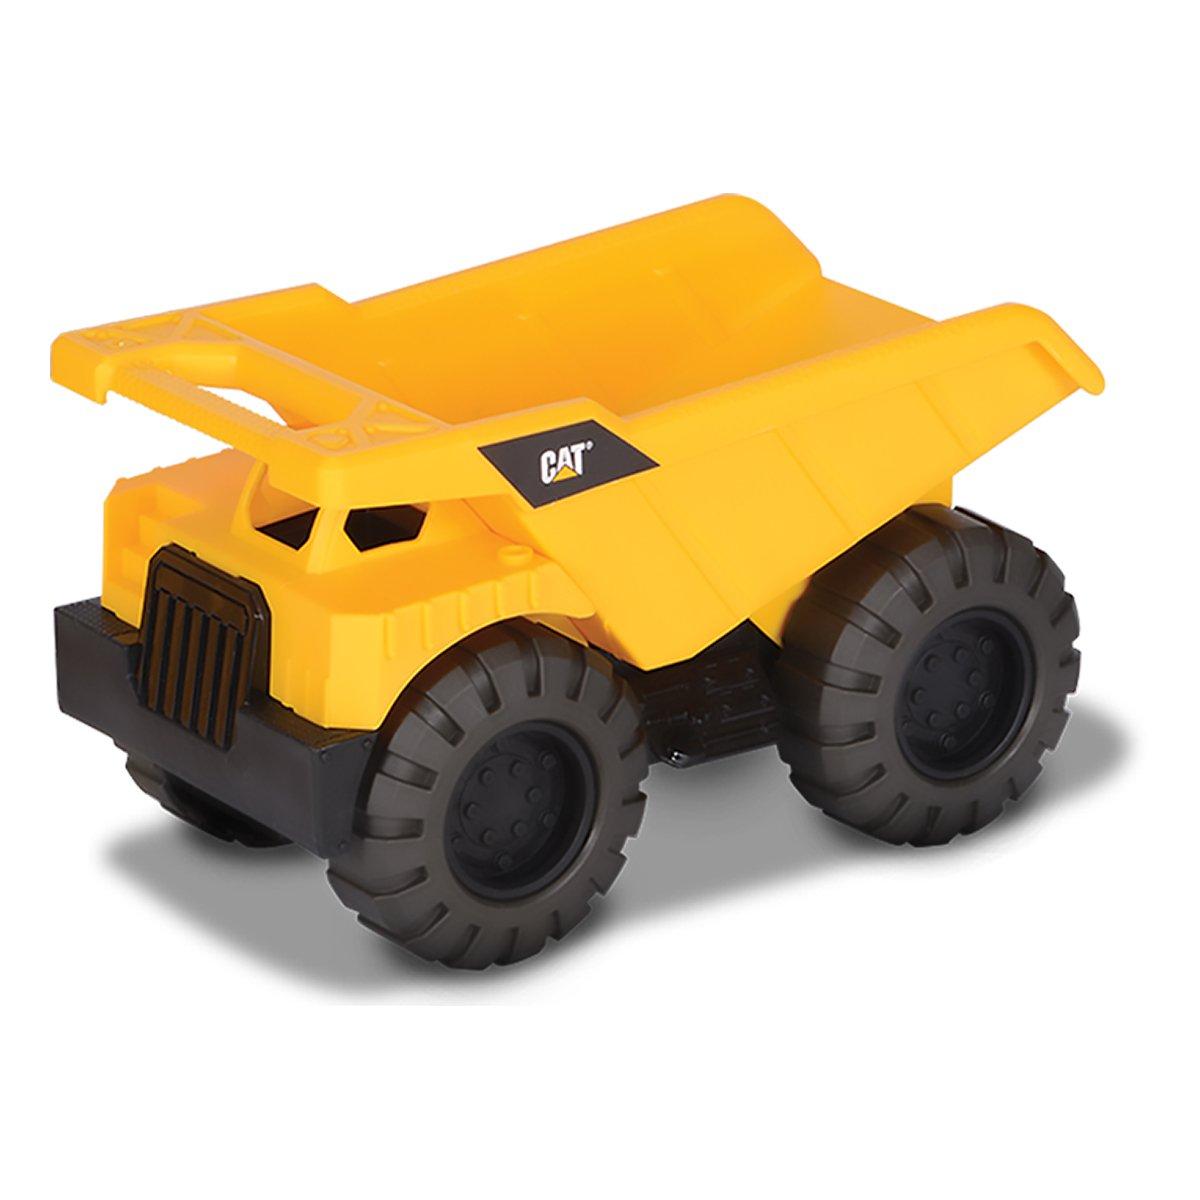 camion de constructie cat toy state crew, 25 cm